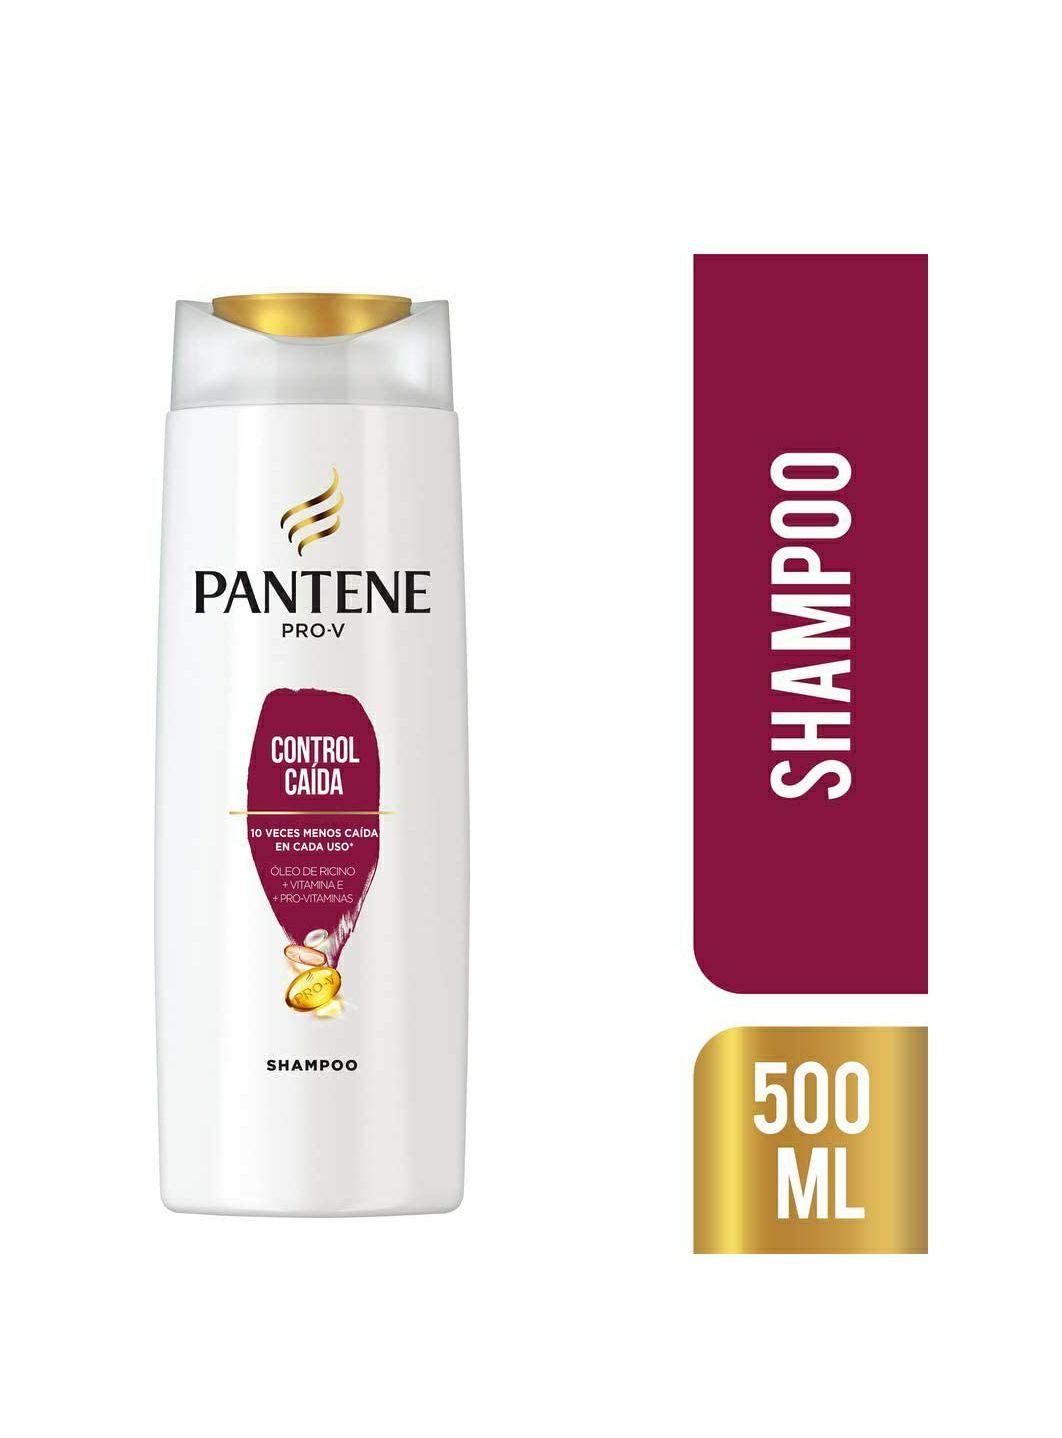 Amazon: Pantene Pro-V Control Caída Shampoo 500ml